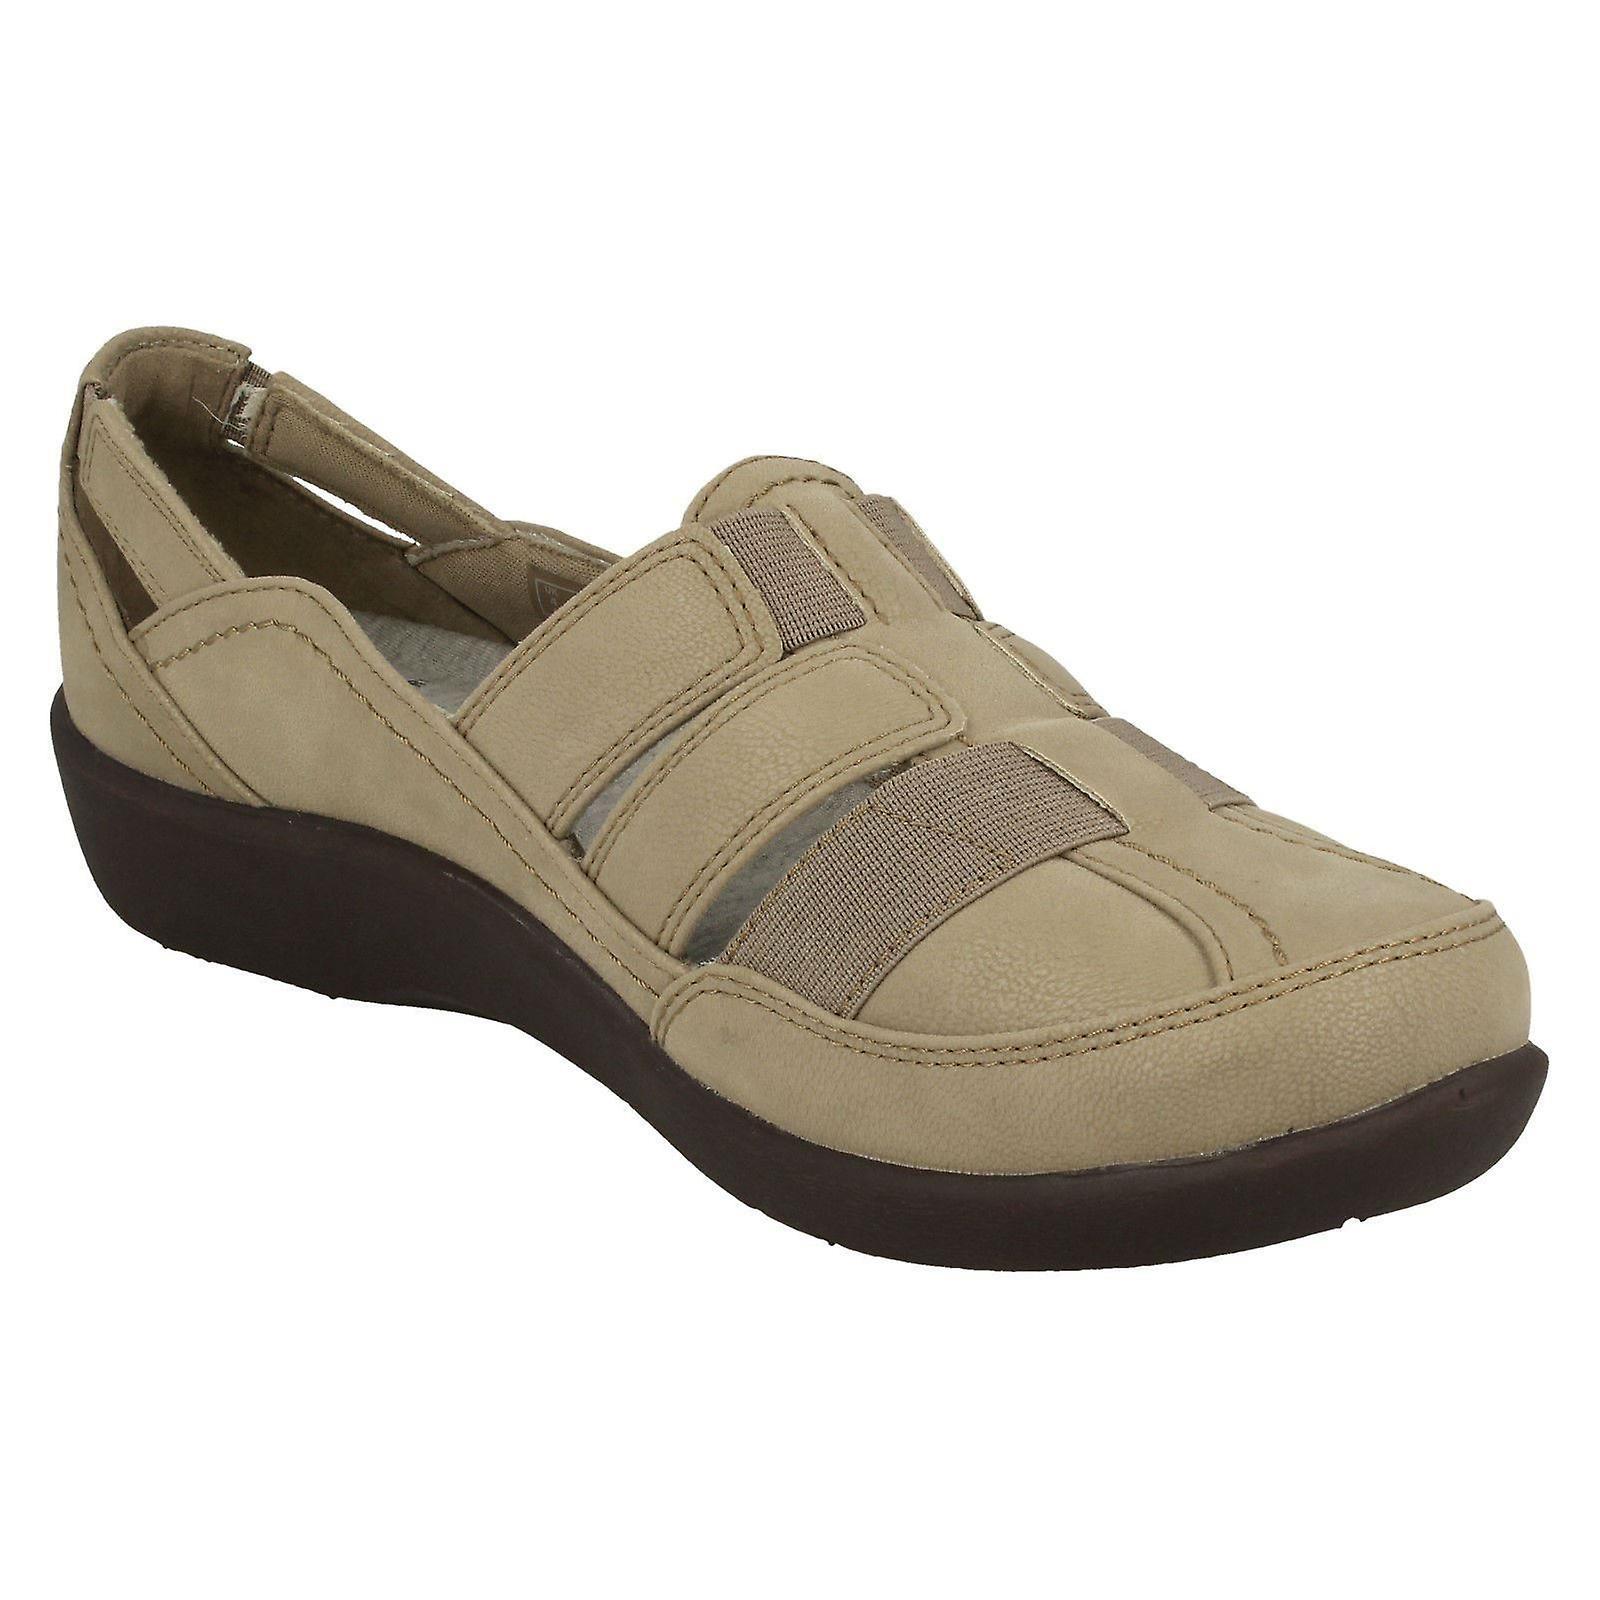 Clarks damskie wsuwane buty Sillian bocian